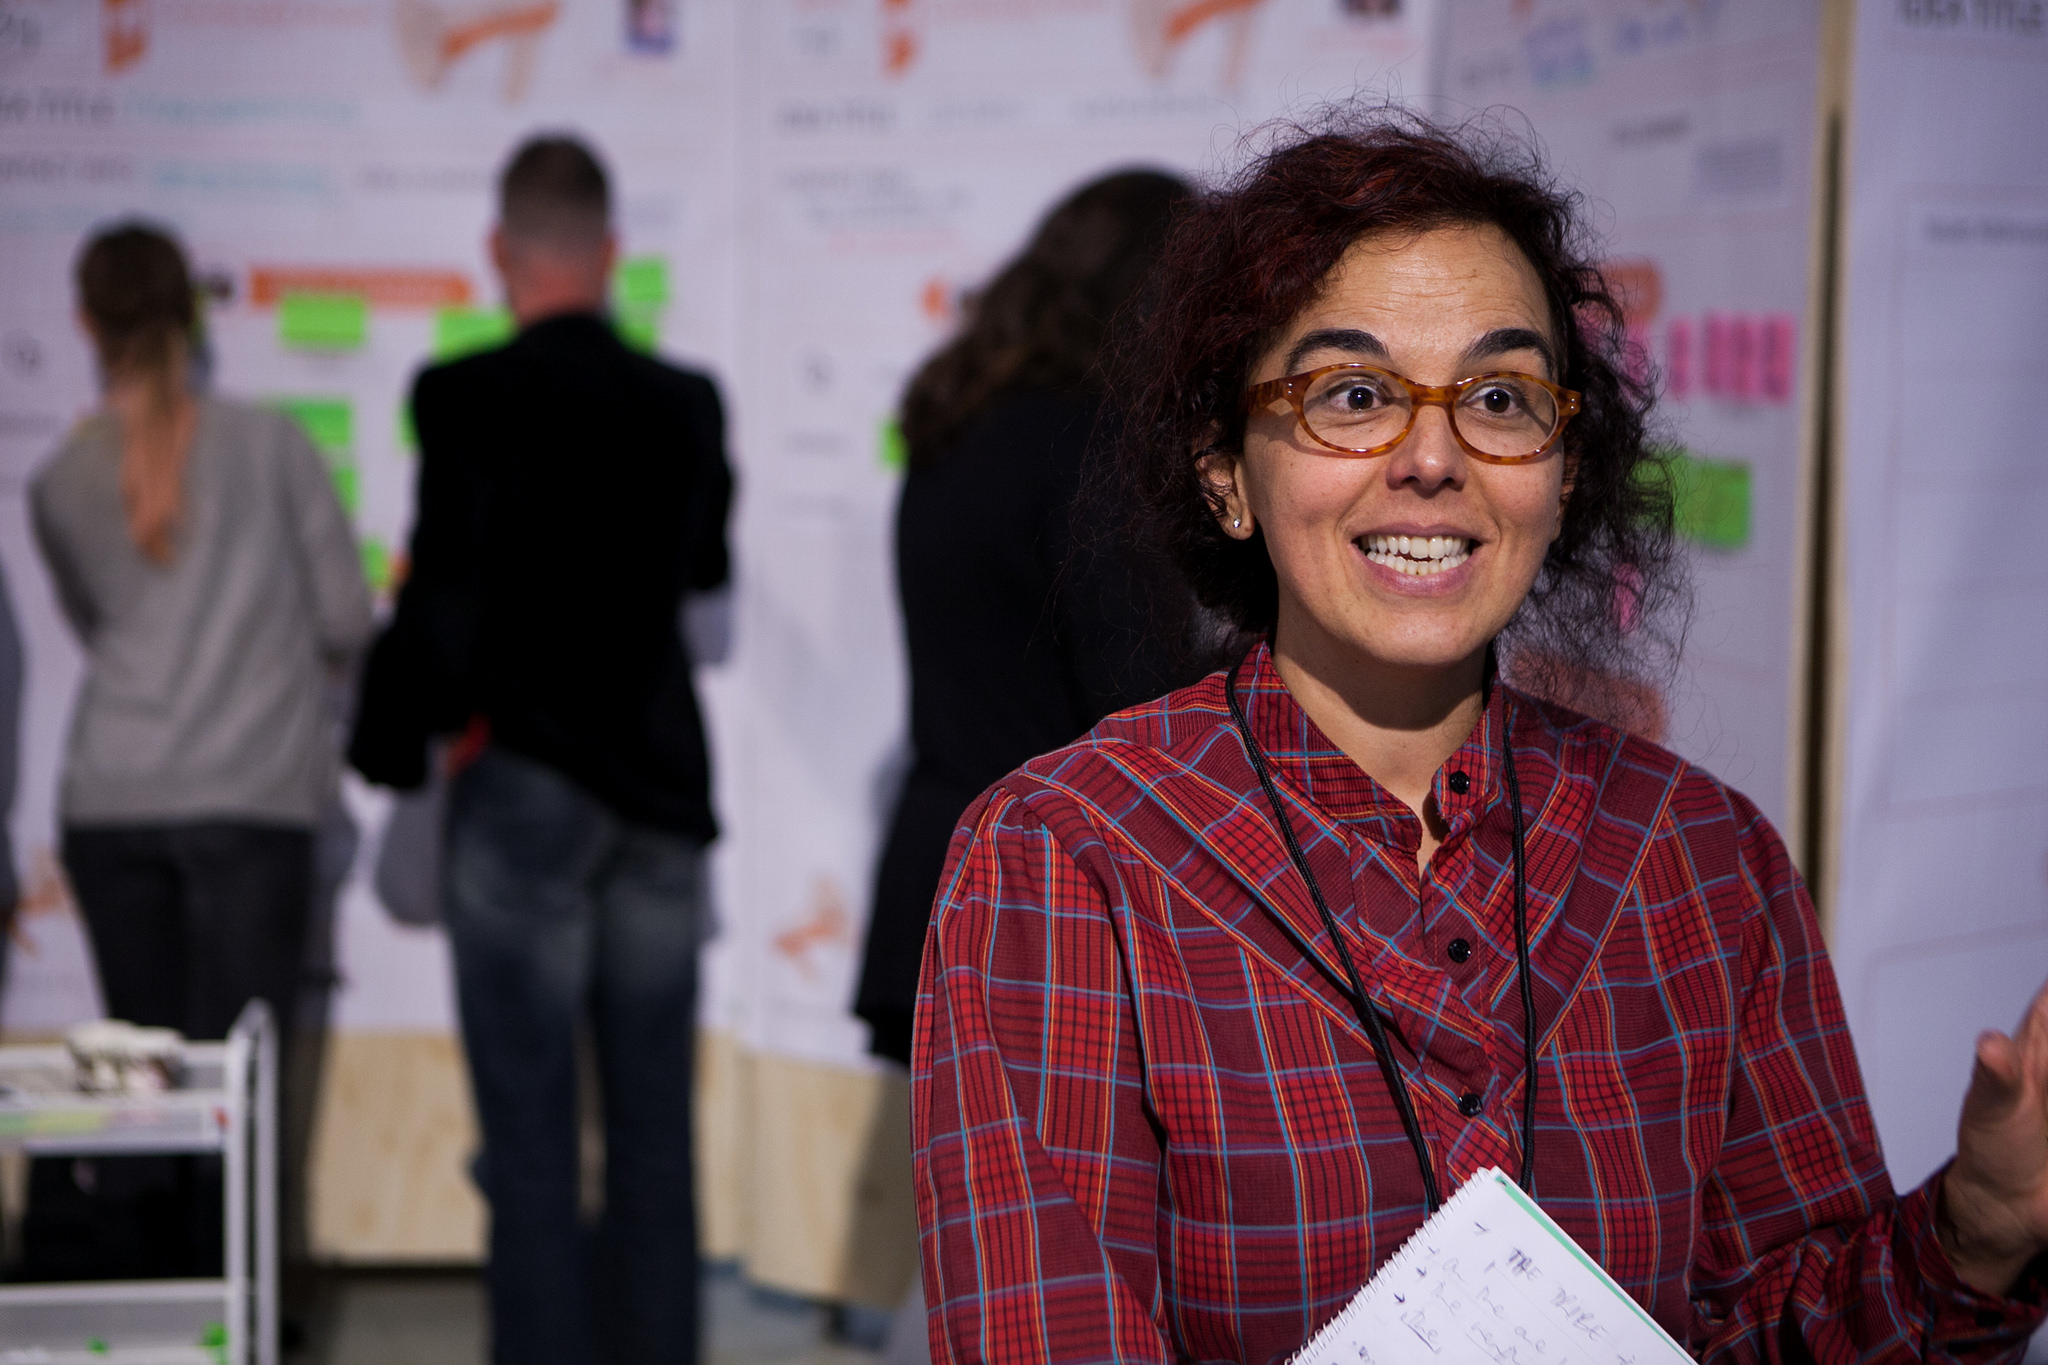 Silvia Nanclares at the Idea Camp 2015. Photo by Julio Albarrán.